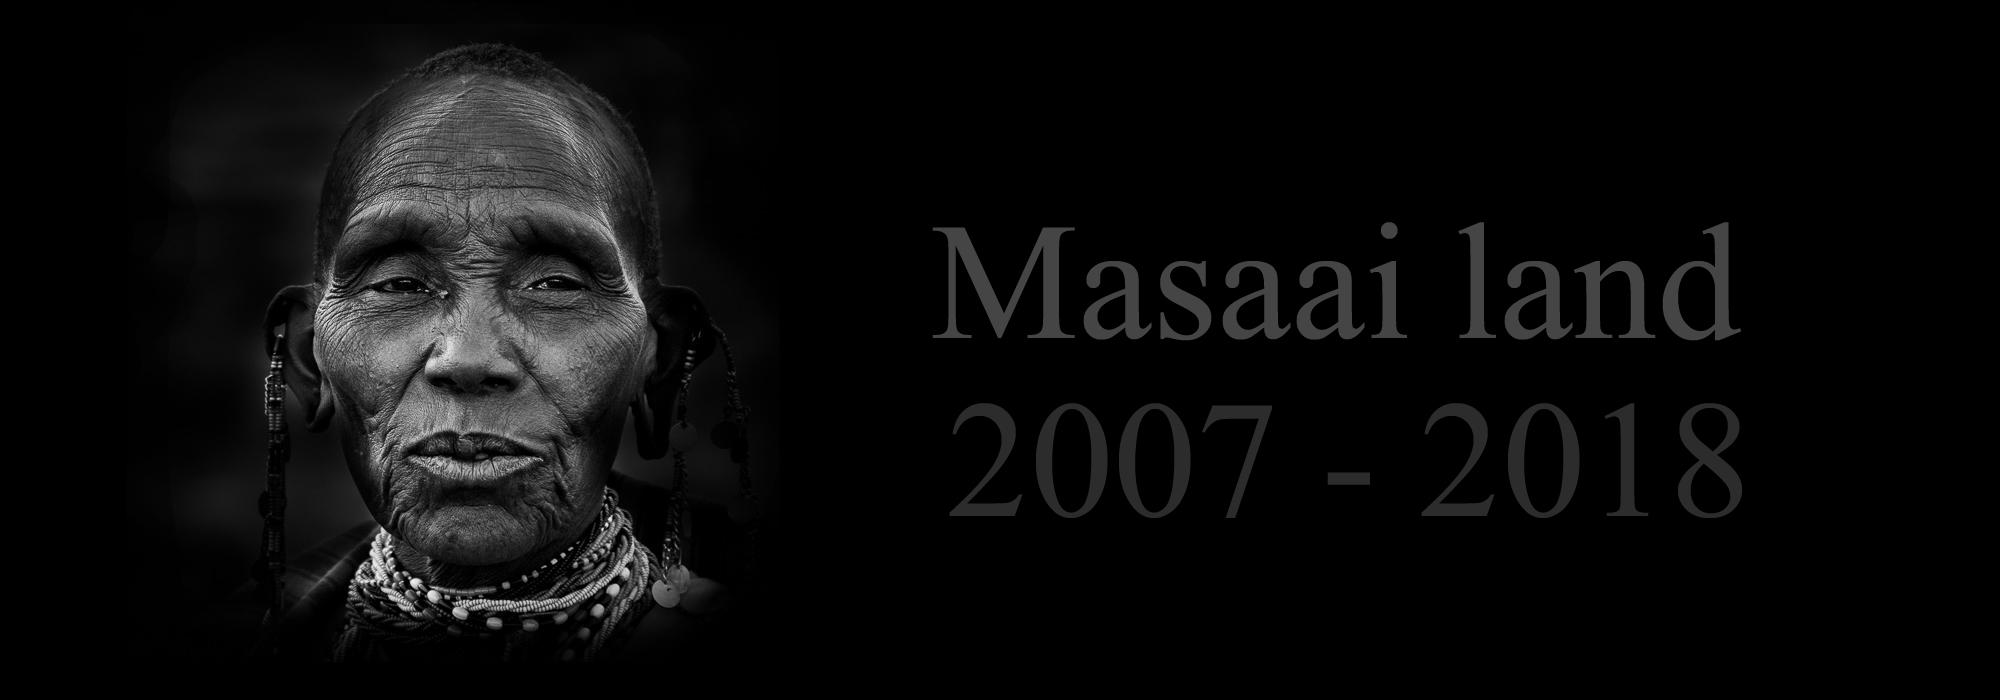 masaai_land_sv.jpg